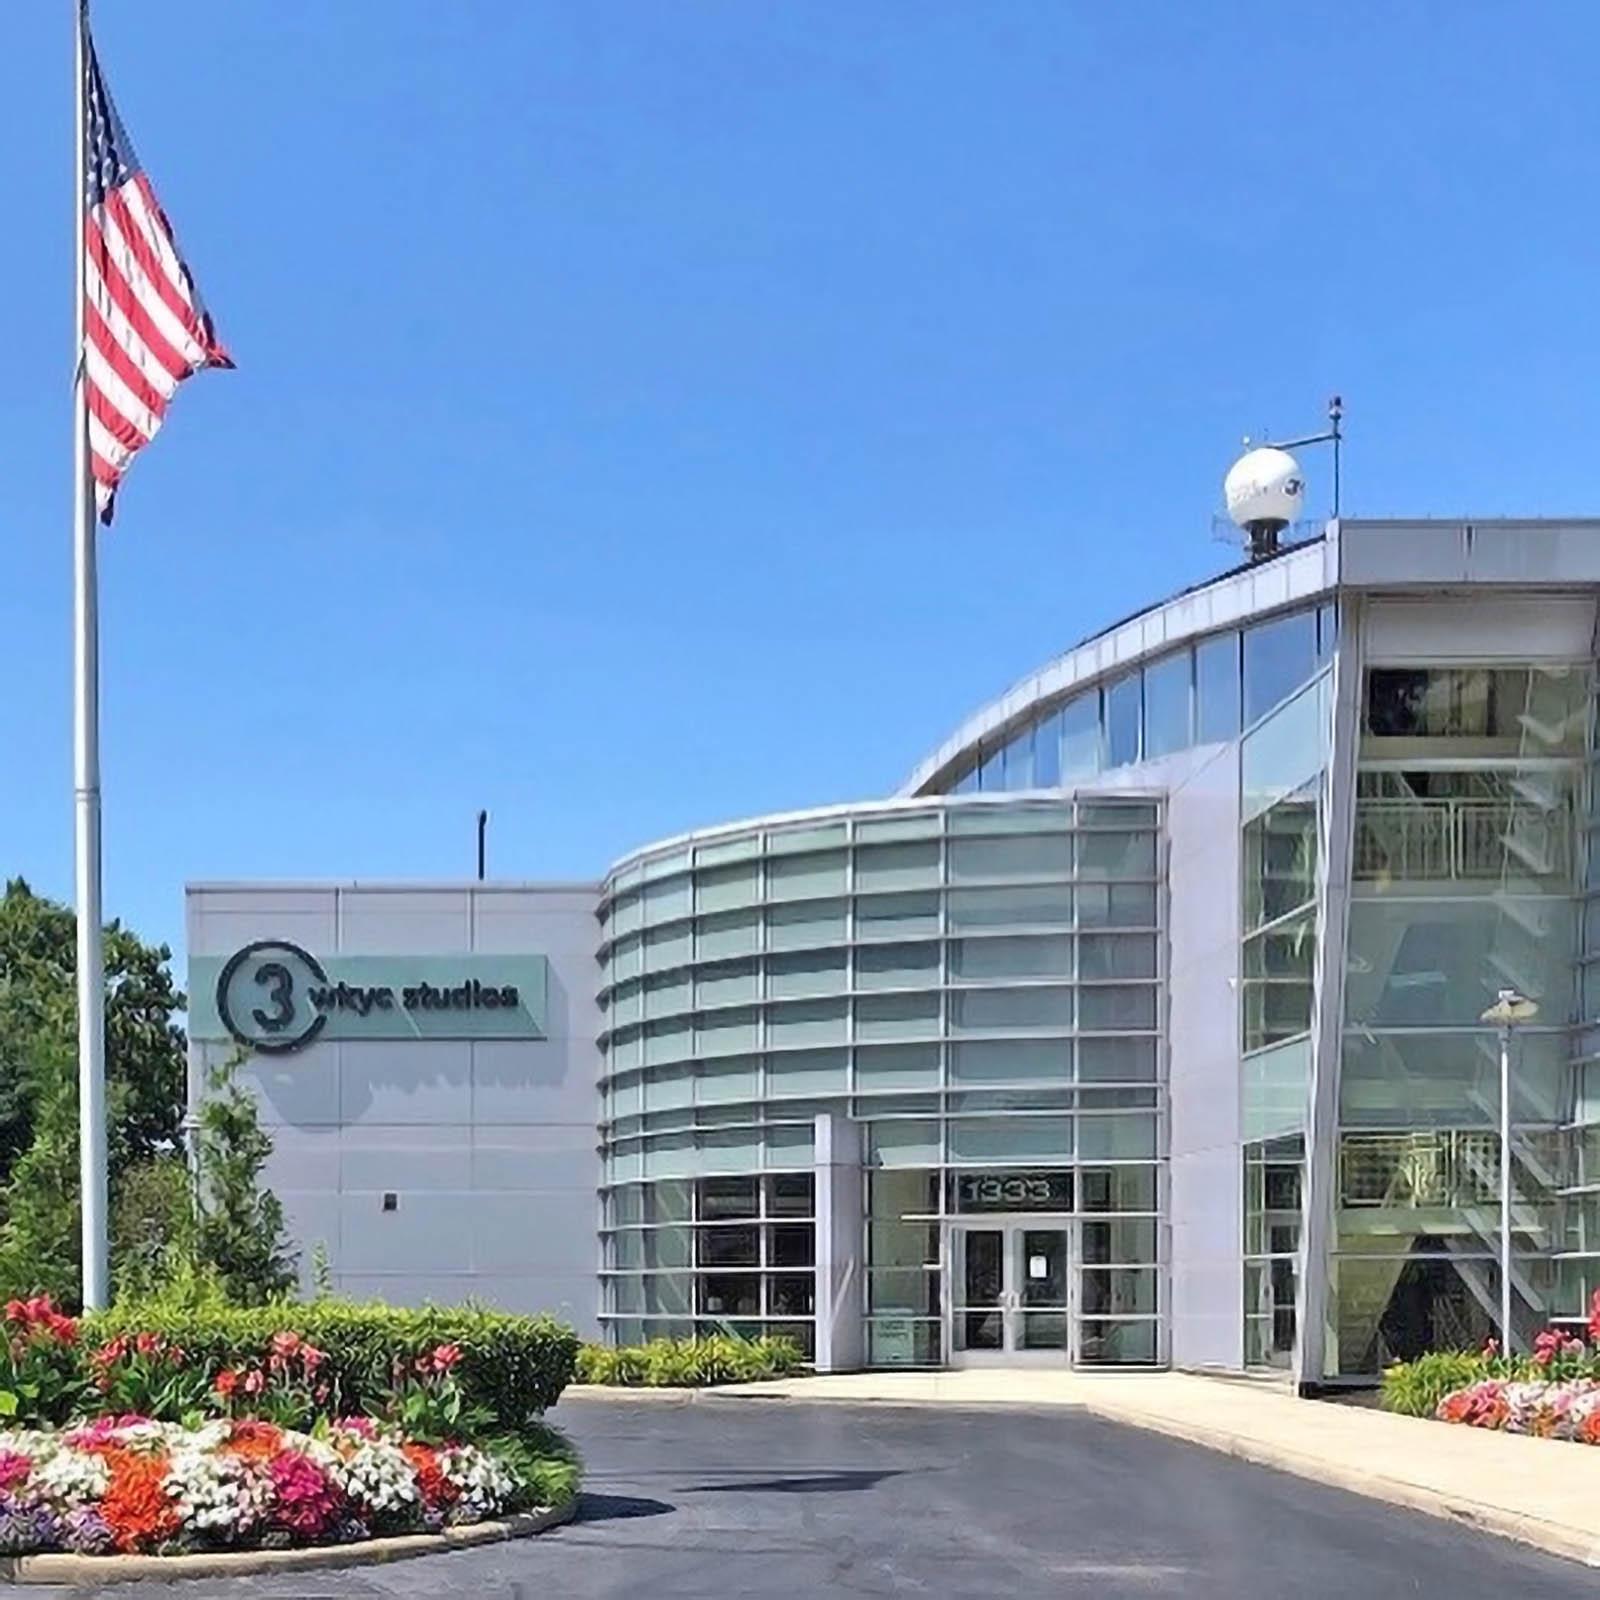 WKYC News headquarters building